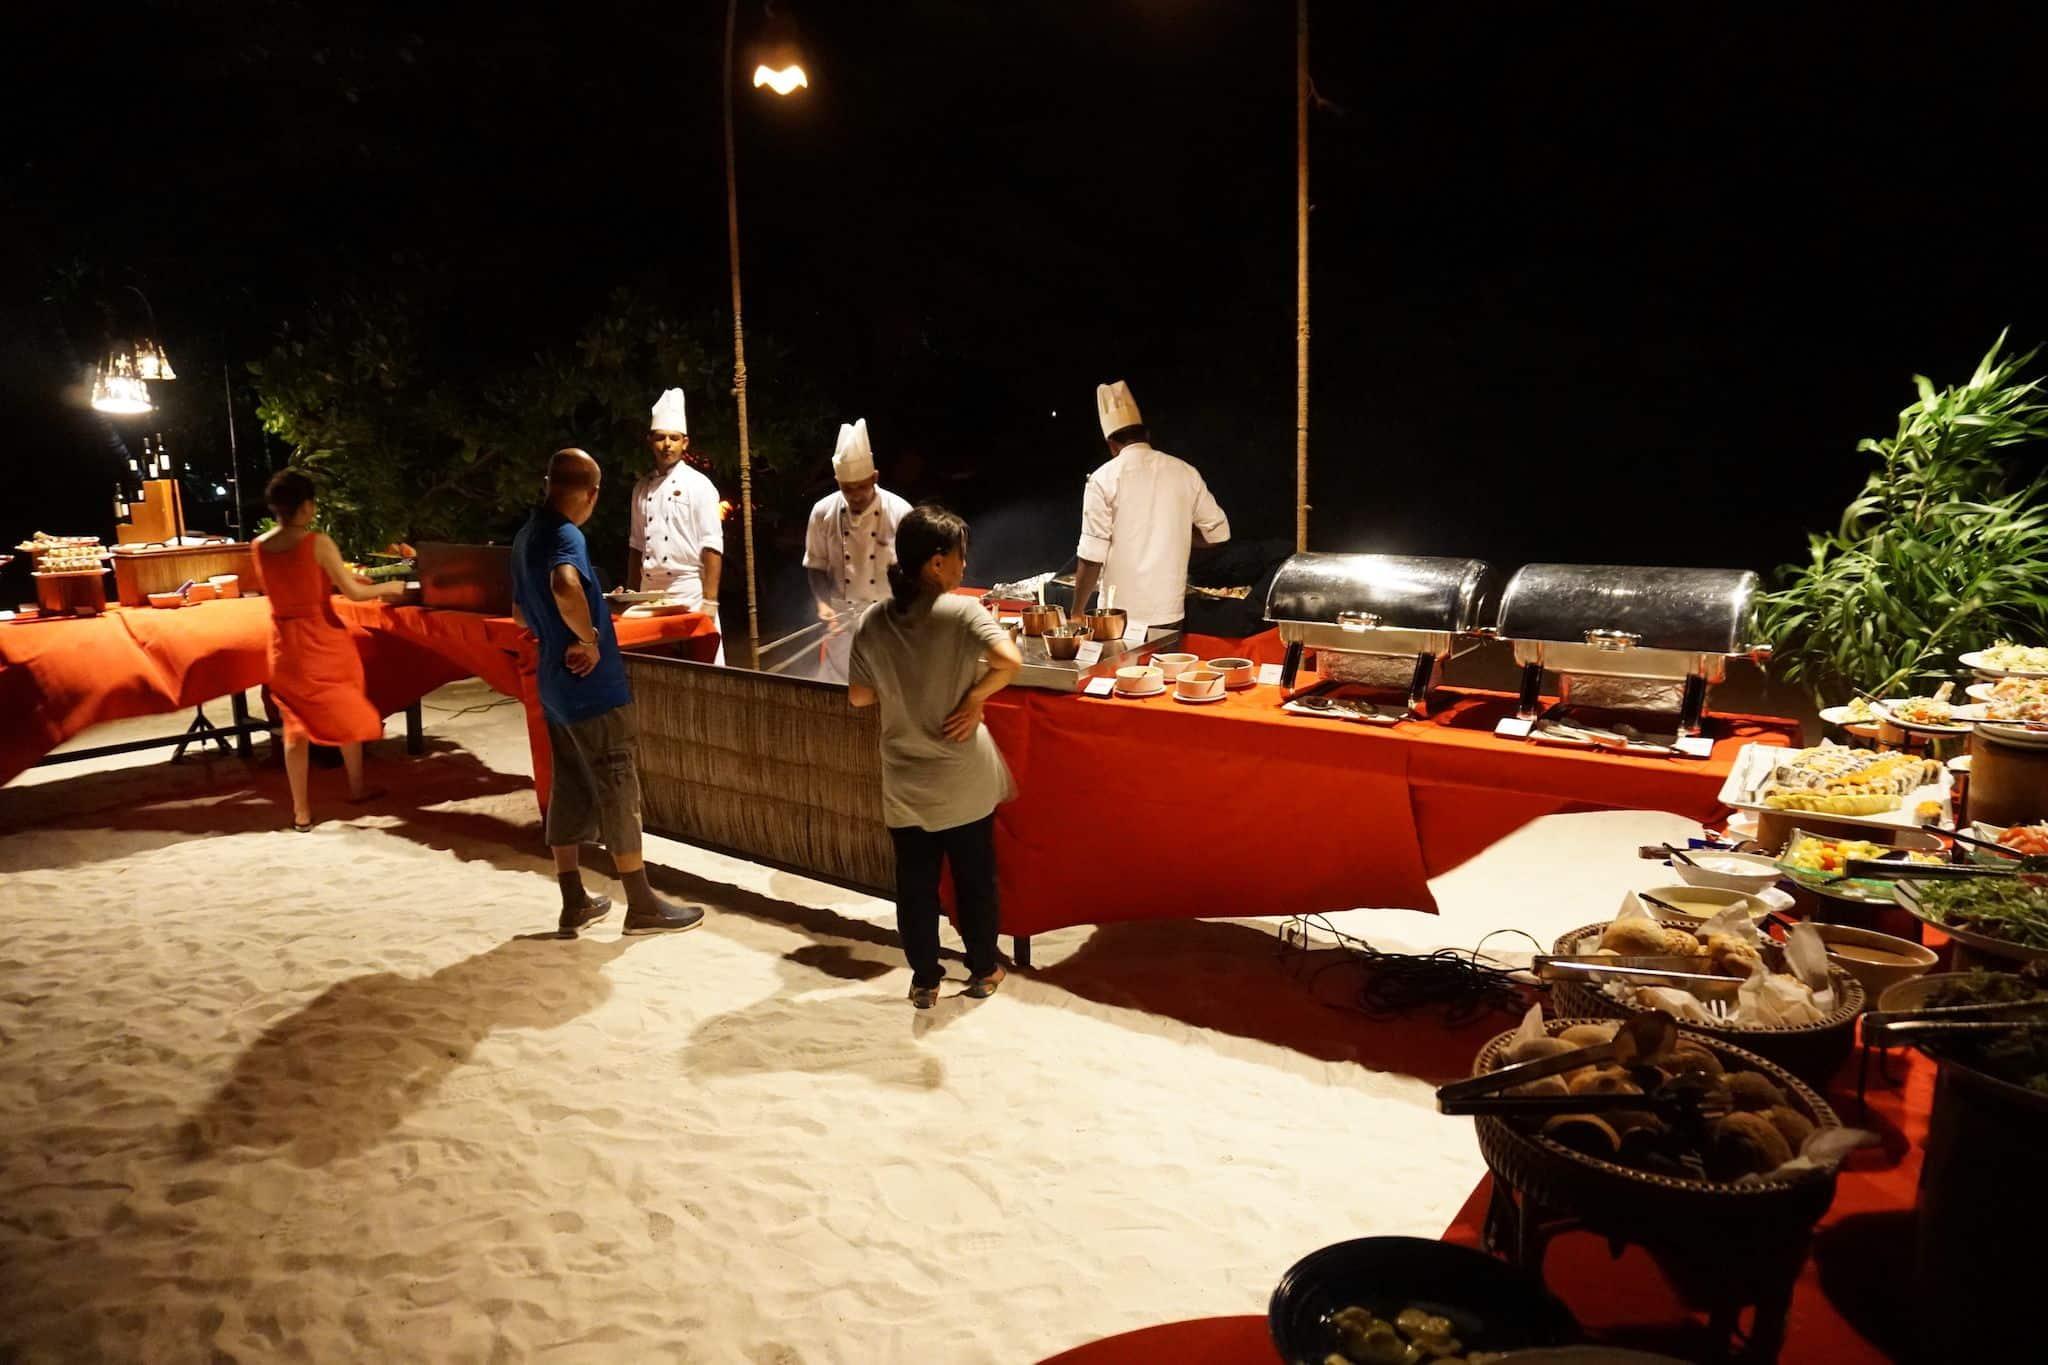 Dinner am Strand ist auf den Malediven total angesagt. Foto: Sascha Tegtmeyer Reisebericht Malediven Tipps